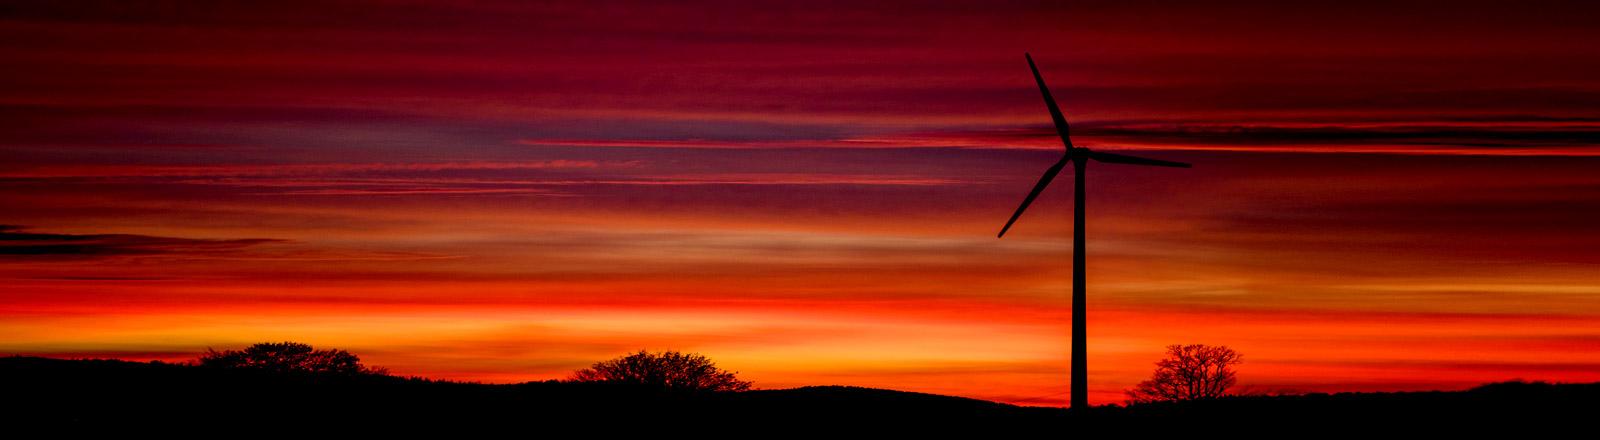 Windrad in der Abendsonne